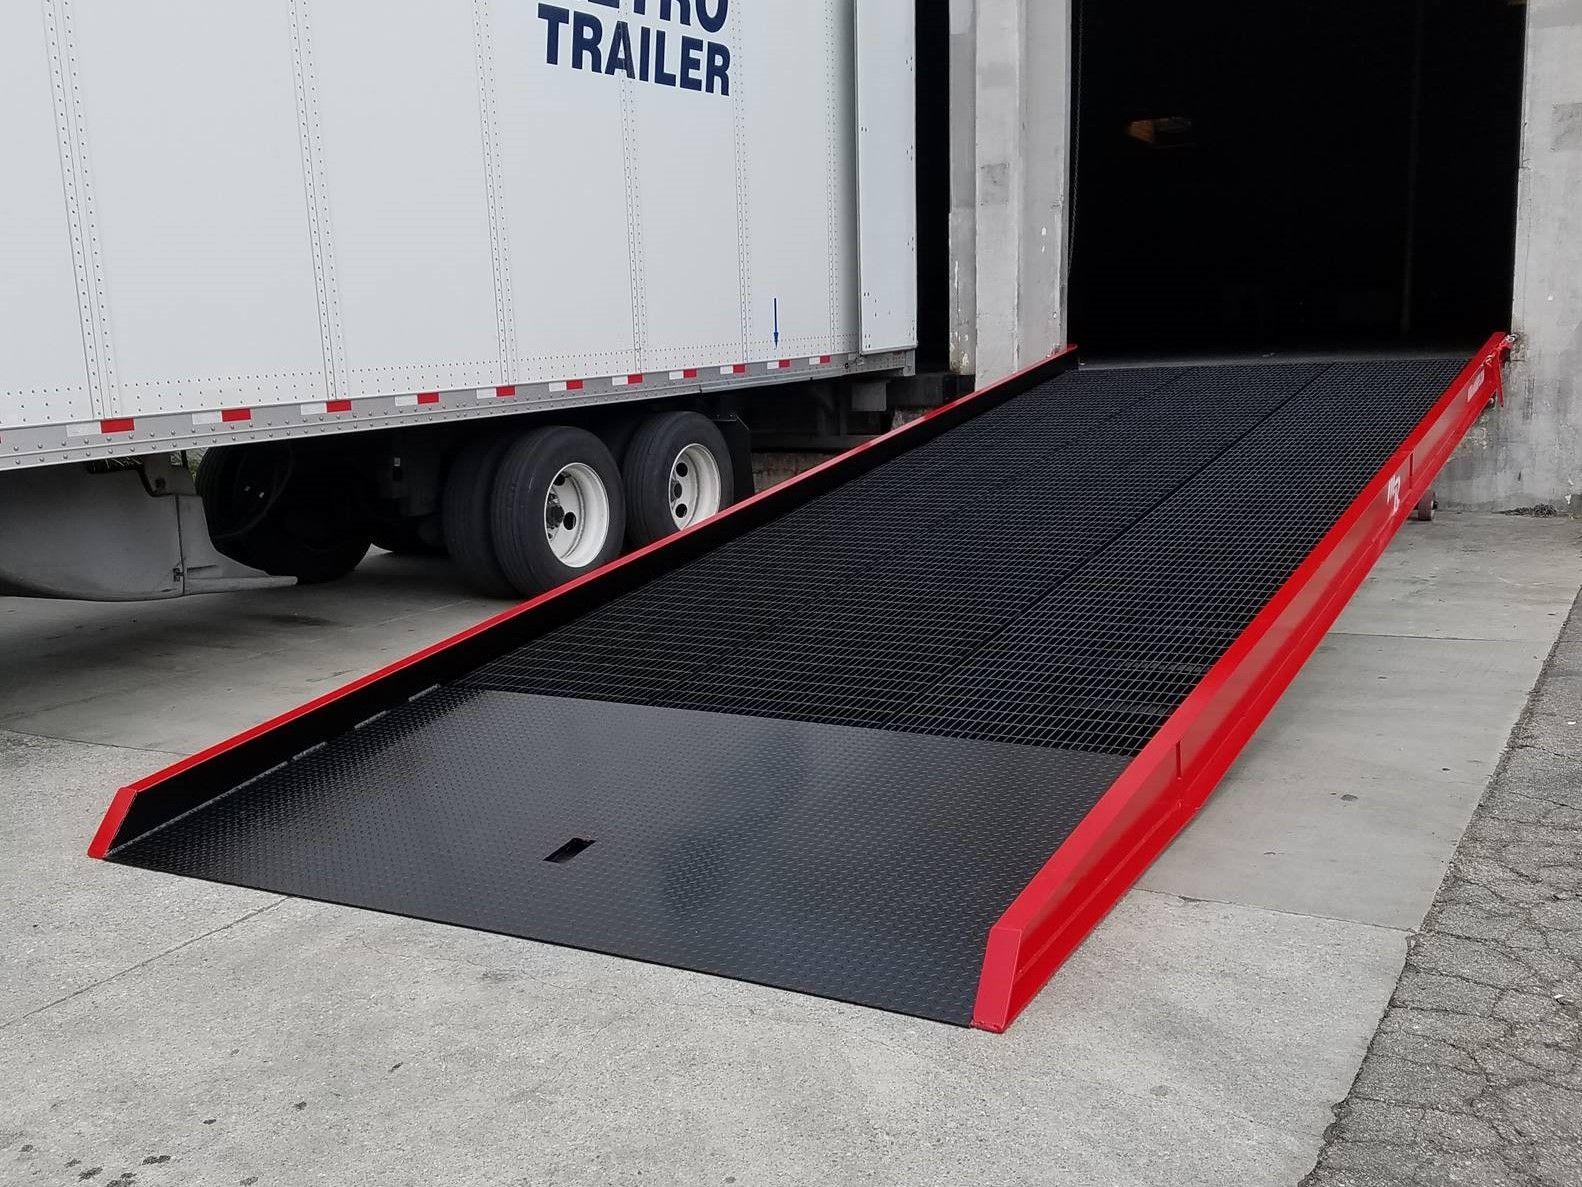 Medlin Ramps' loading dock ramp, which utilizes McNICHOLS® Serrated Bar Grating